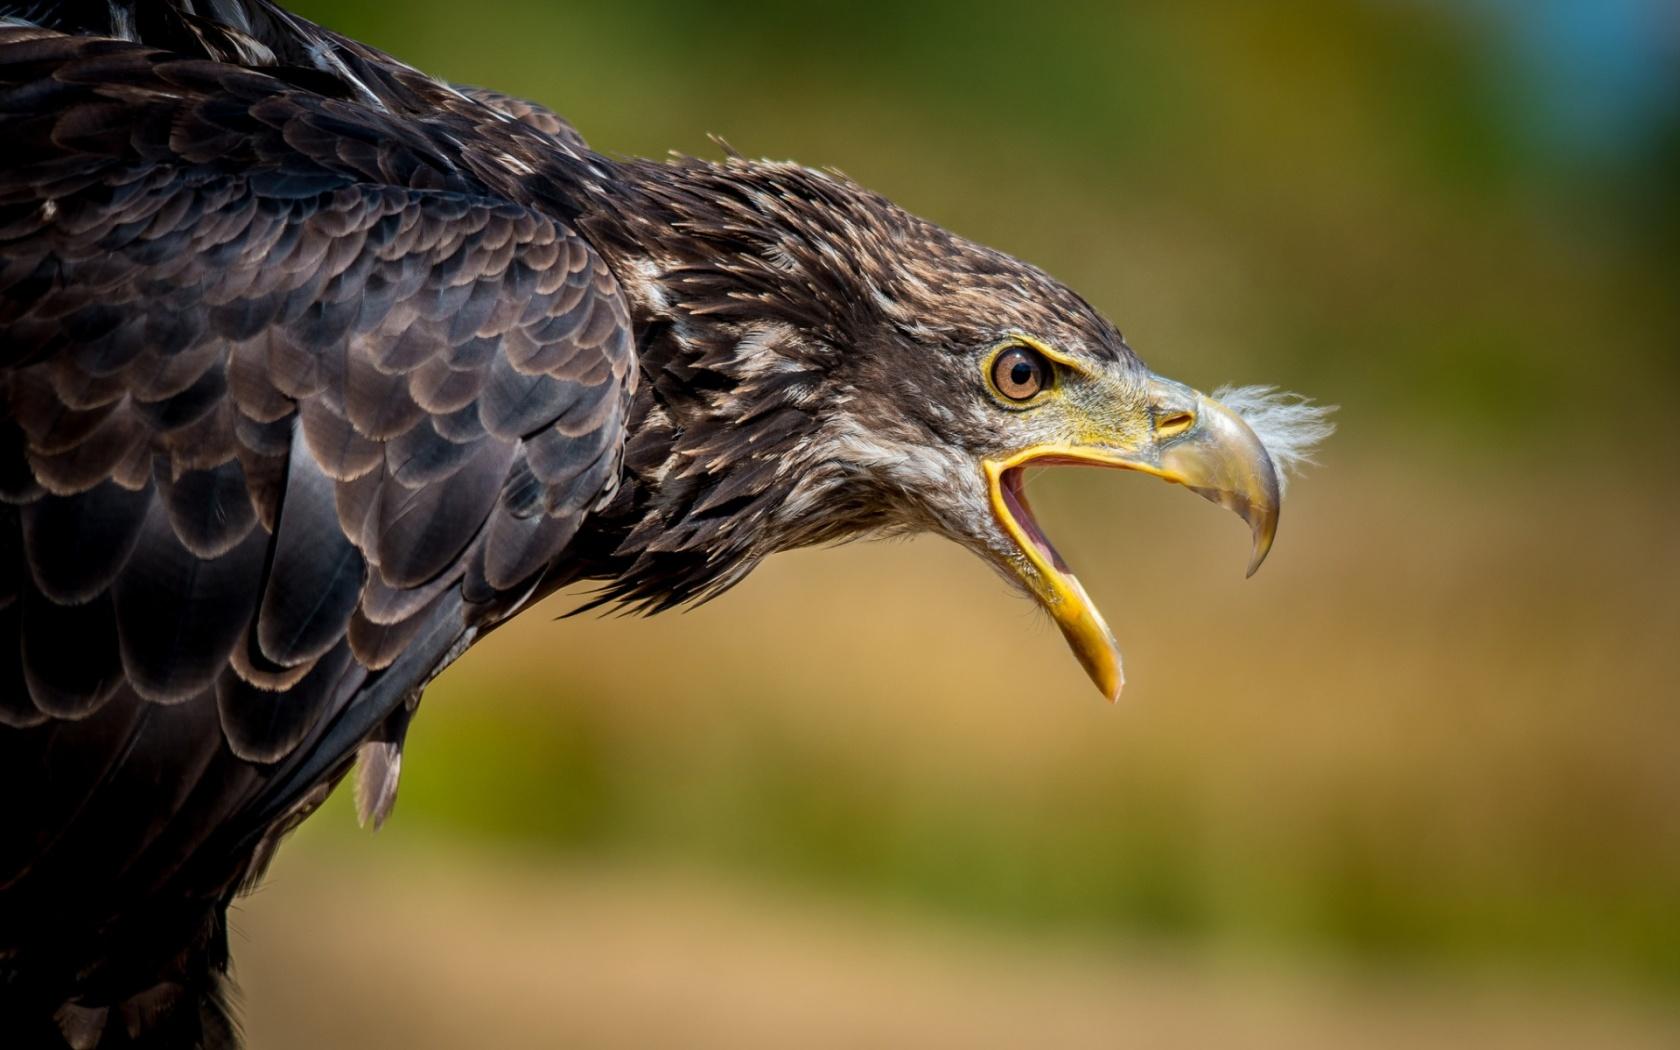 Eagle beak - photo#24